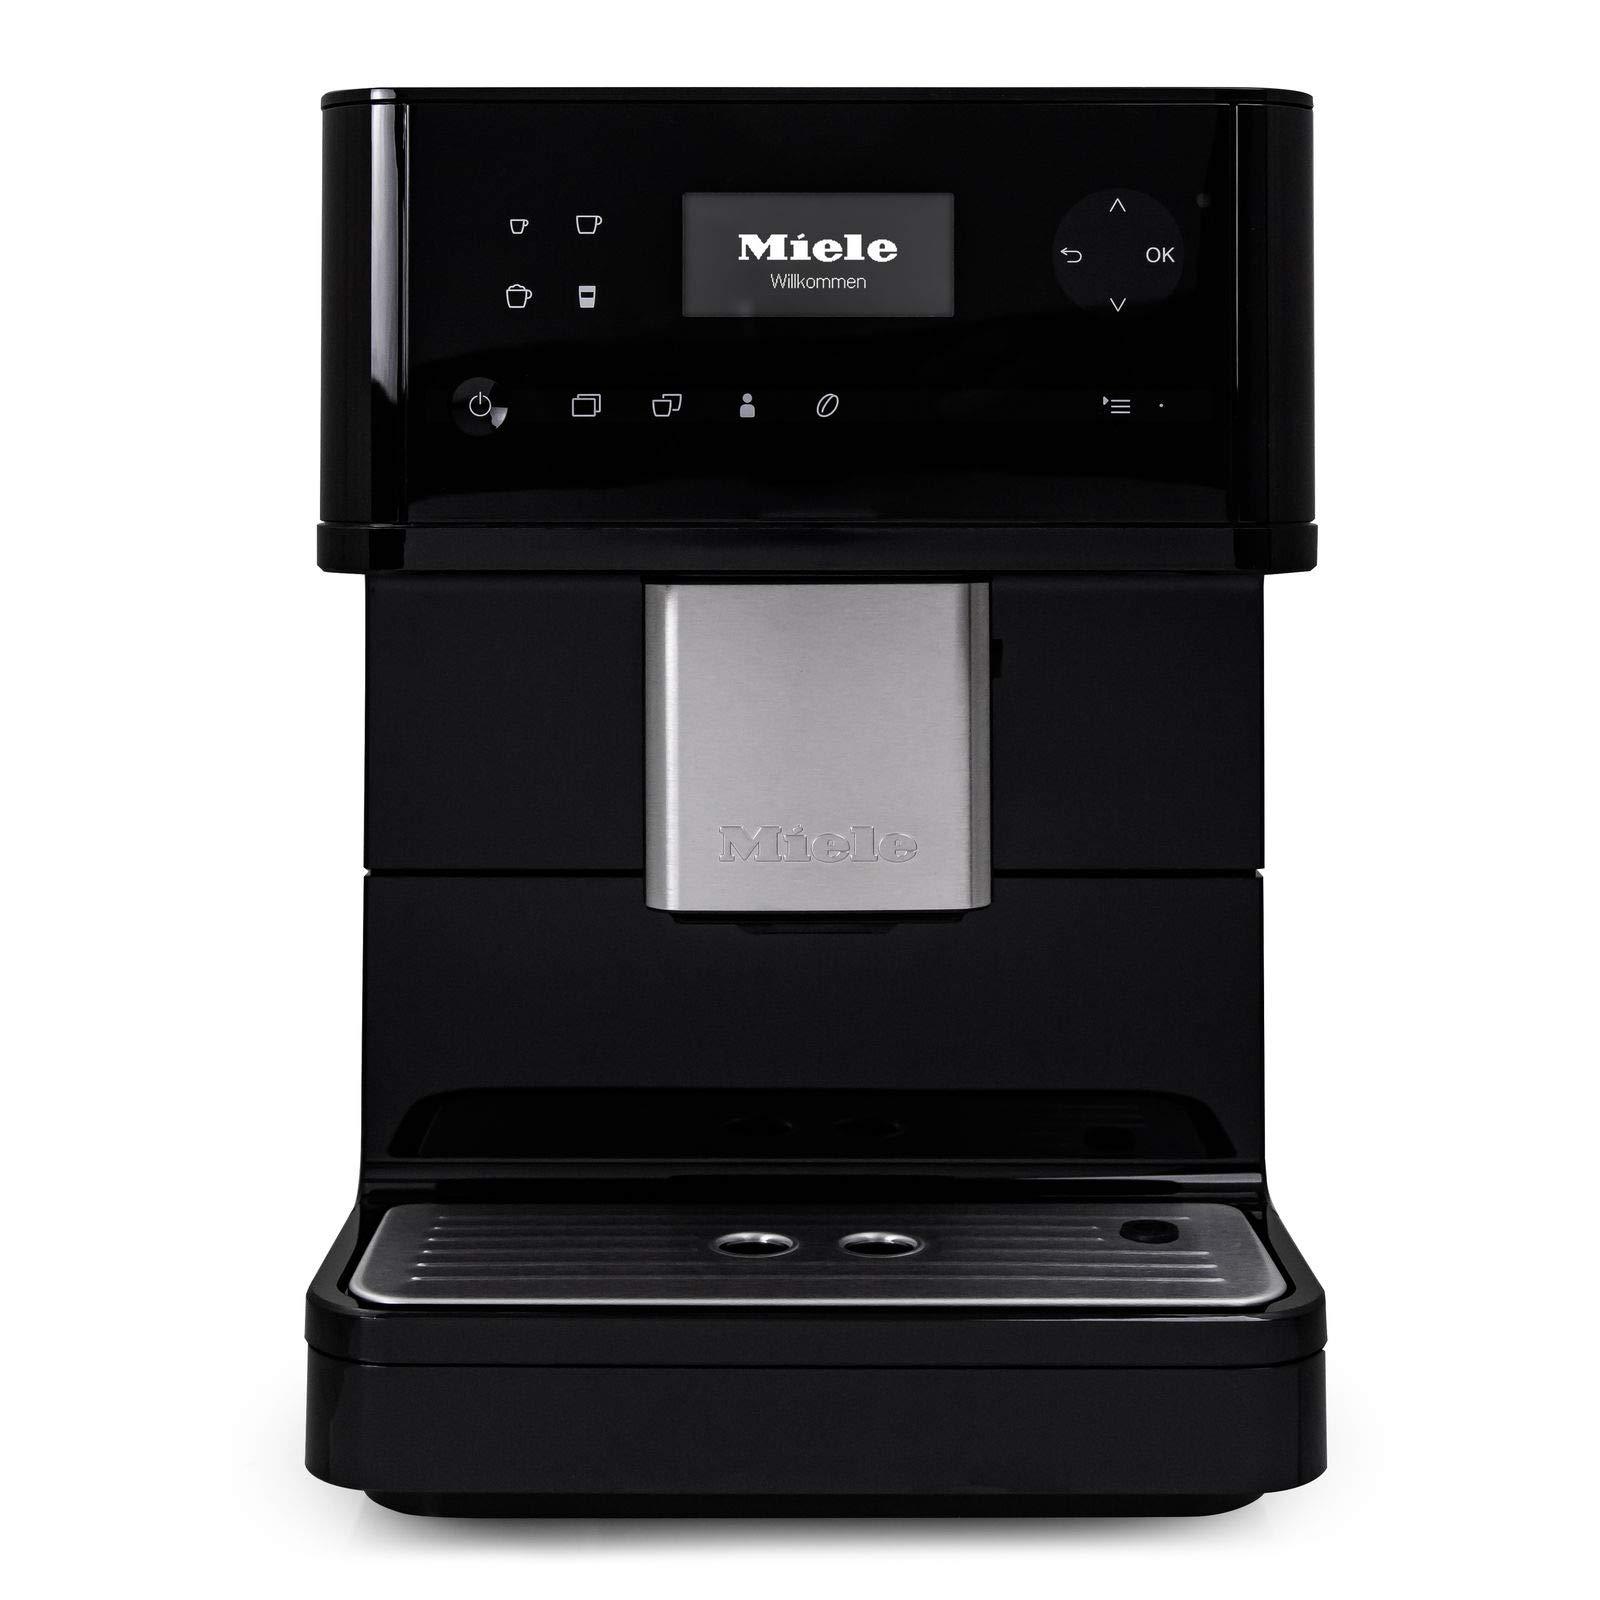 Miele CM6150 OneTouch Countertop Super Automatic Coffee & Espresso Machine (Obsidan Black) by Miele